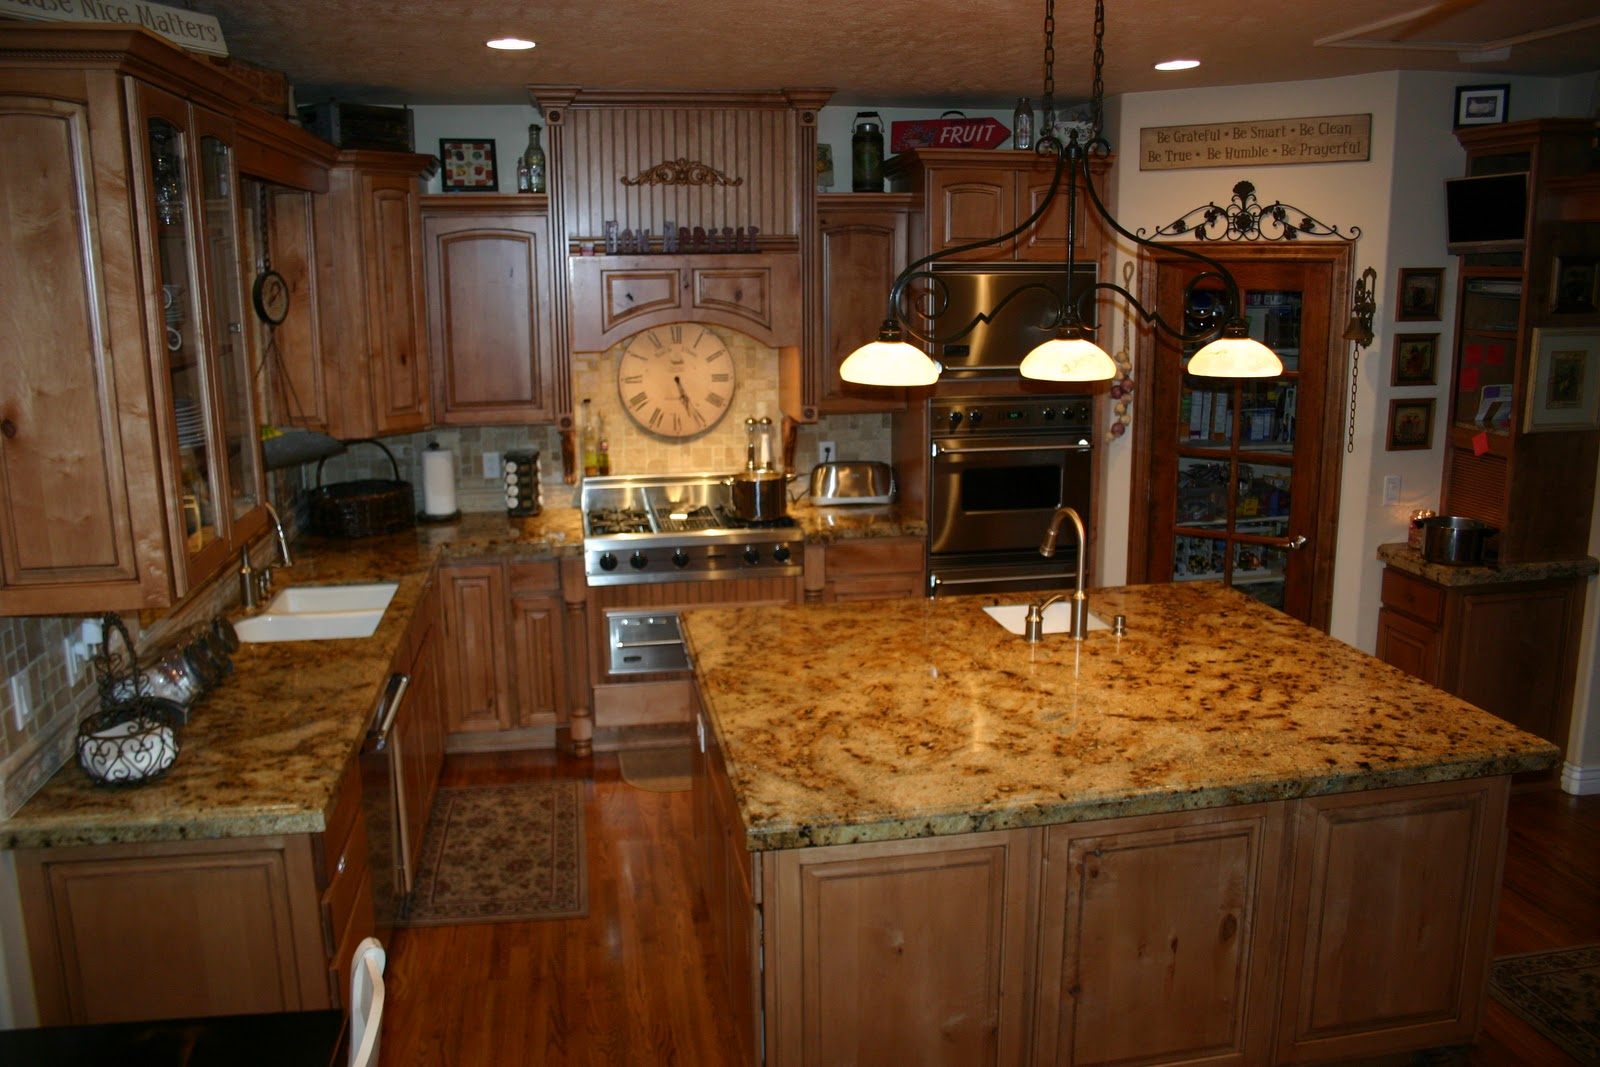 Kitchens With Lapidus Granite Countertops : The granite gurus lapidus kitchen